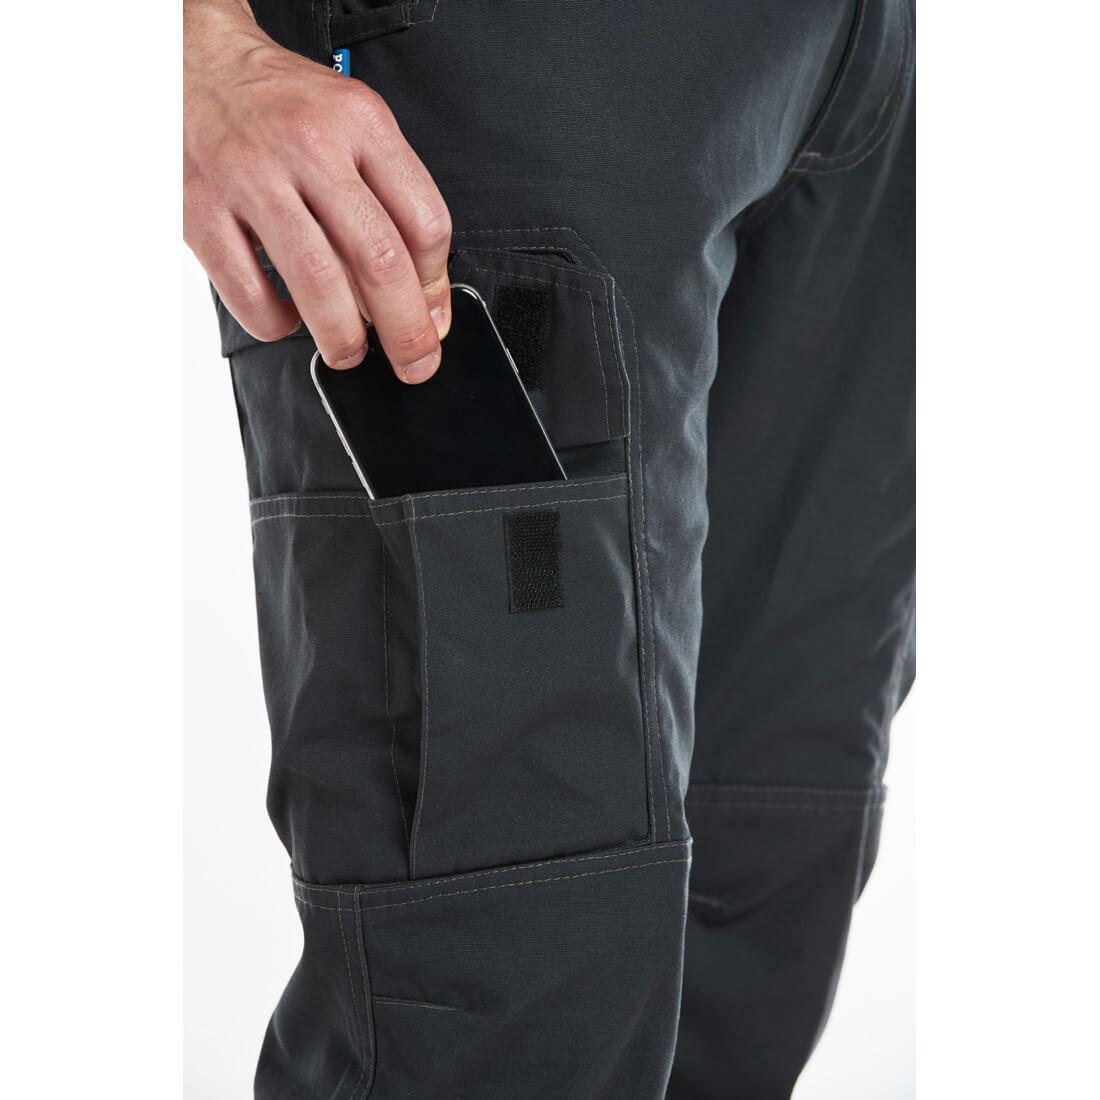 KX3 Pantaloni Cargo - Imbracaminte de protectie